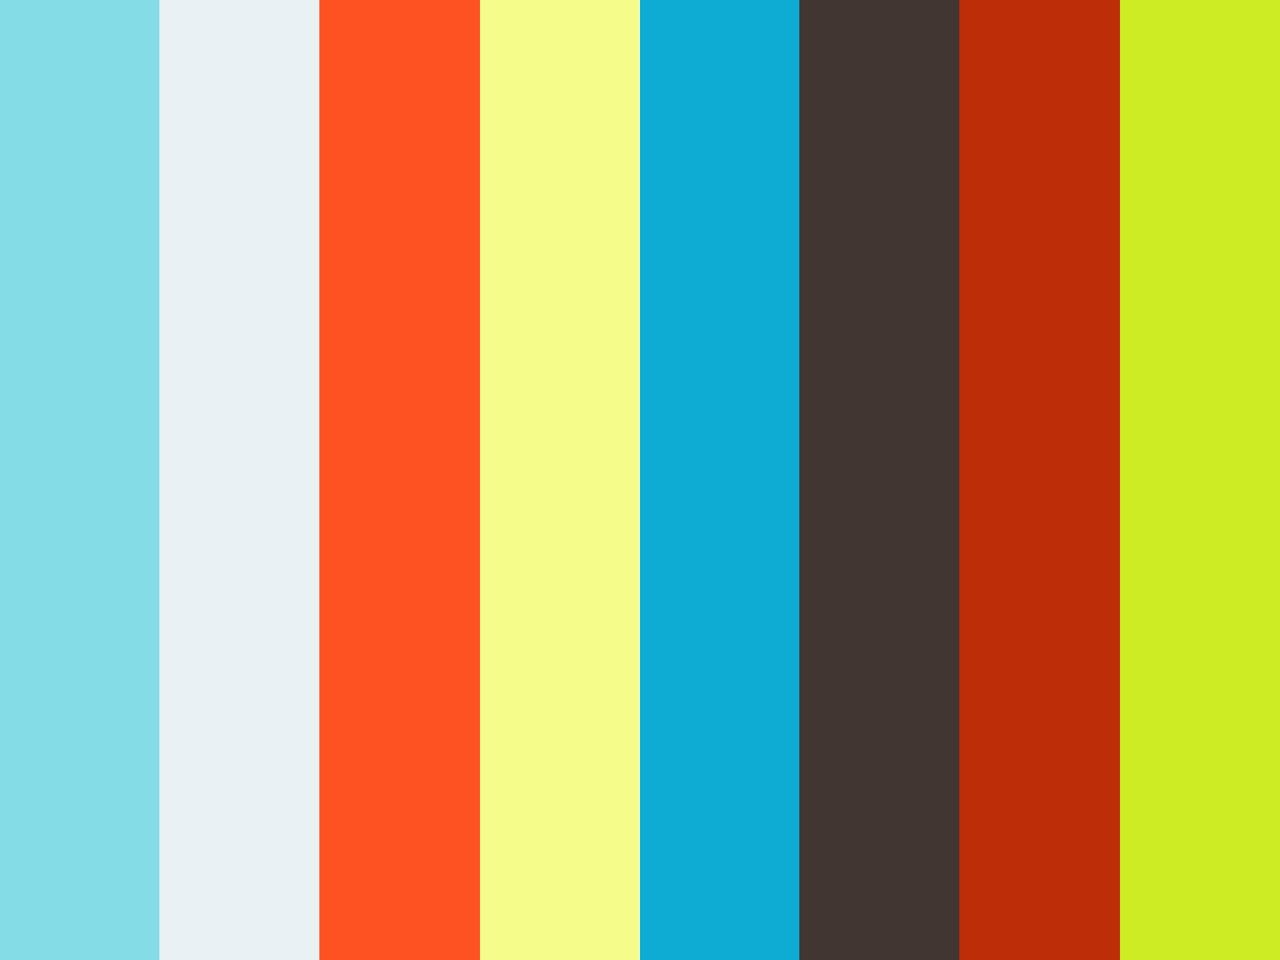 Astro Boy - Rough Layout